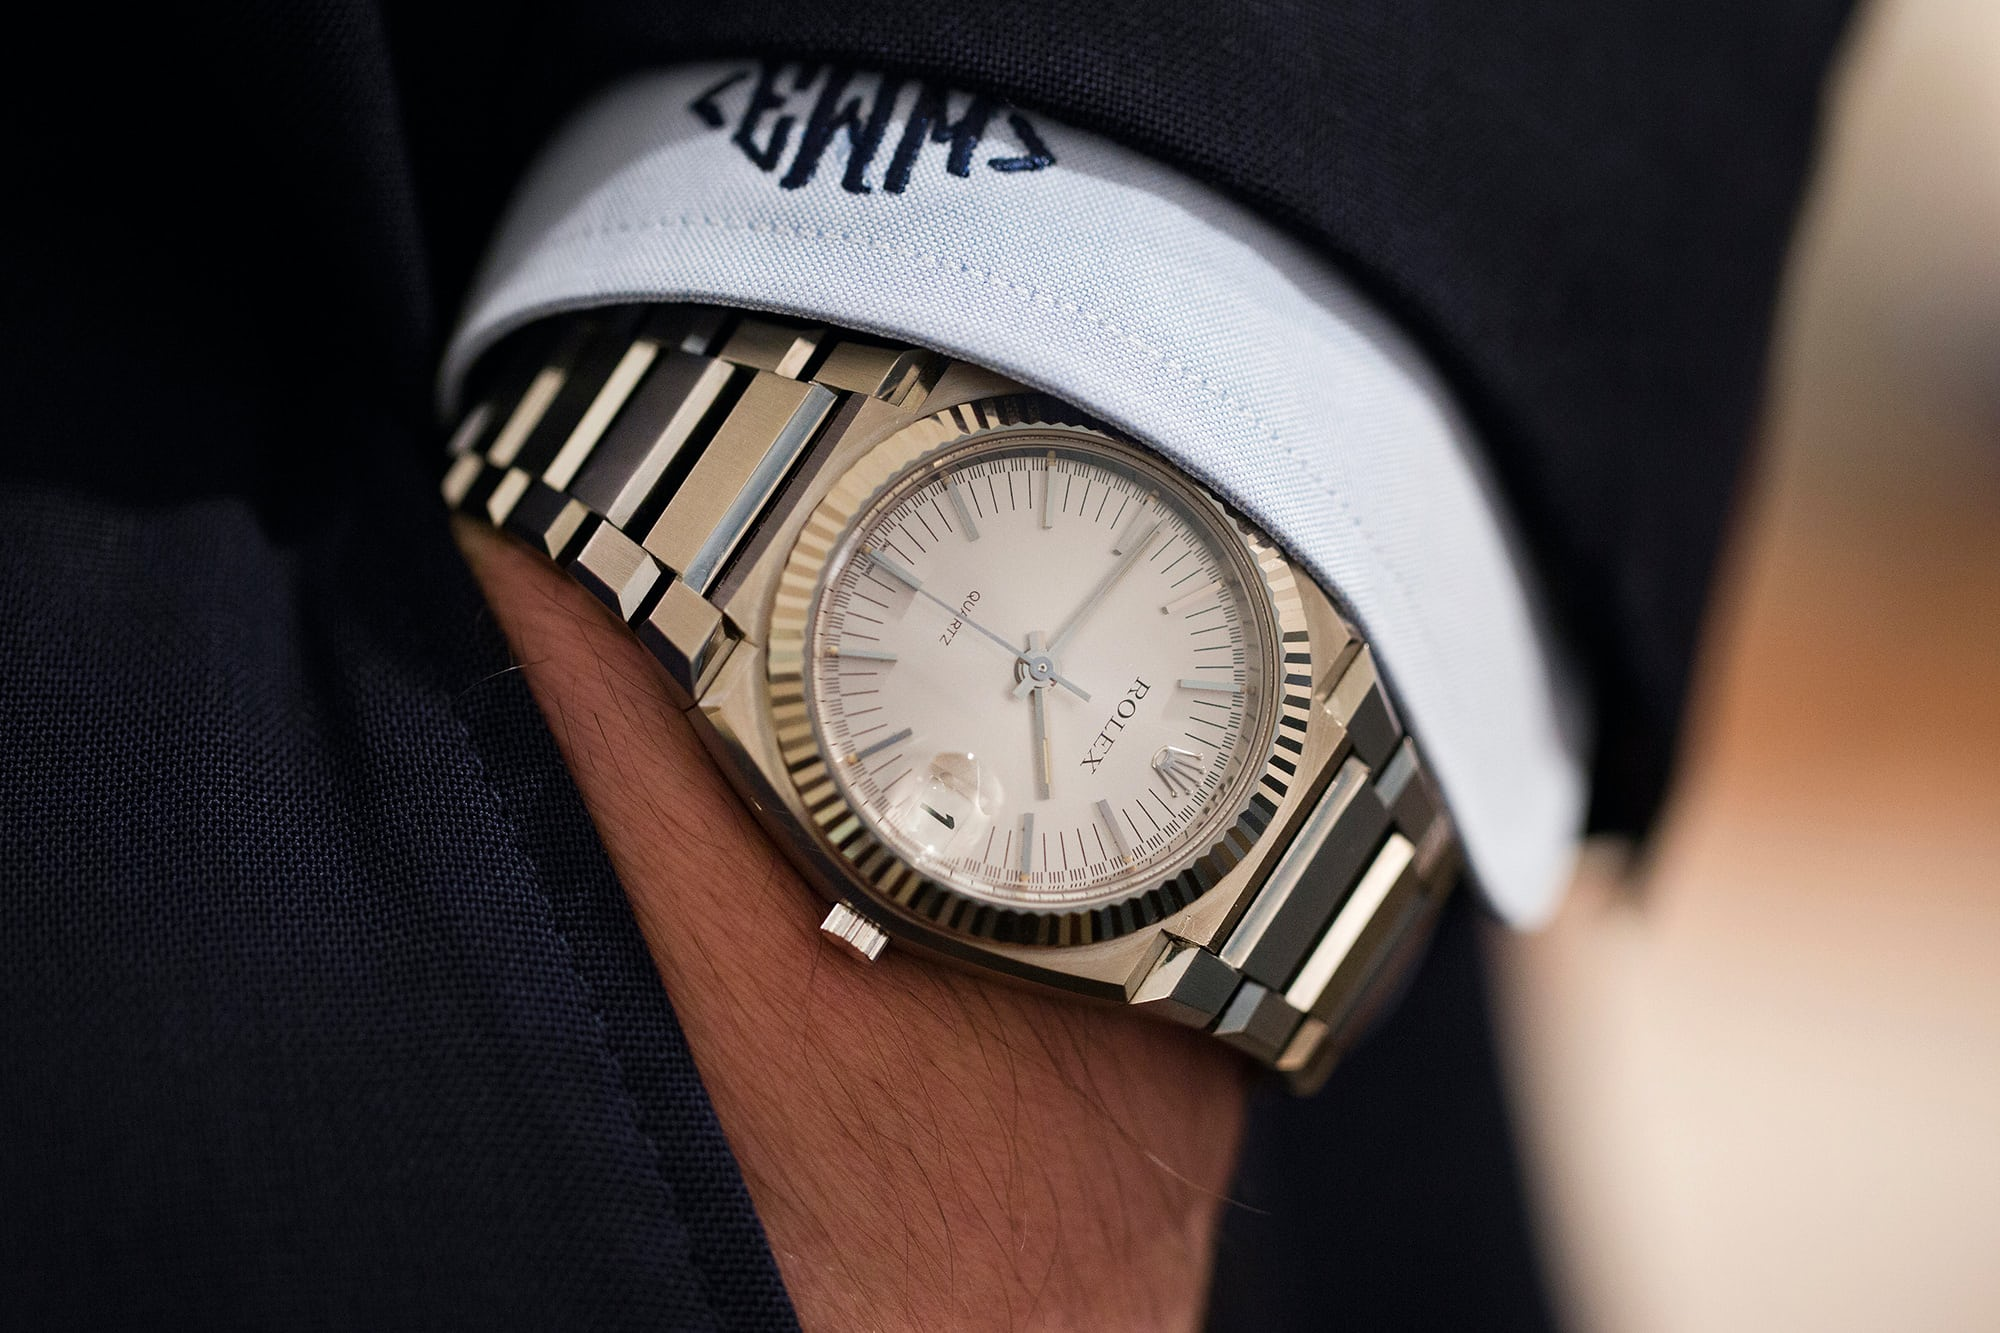 Rolex Ref. 5100 white gold christies